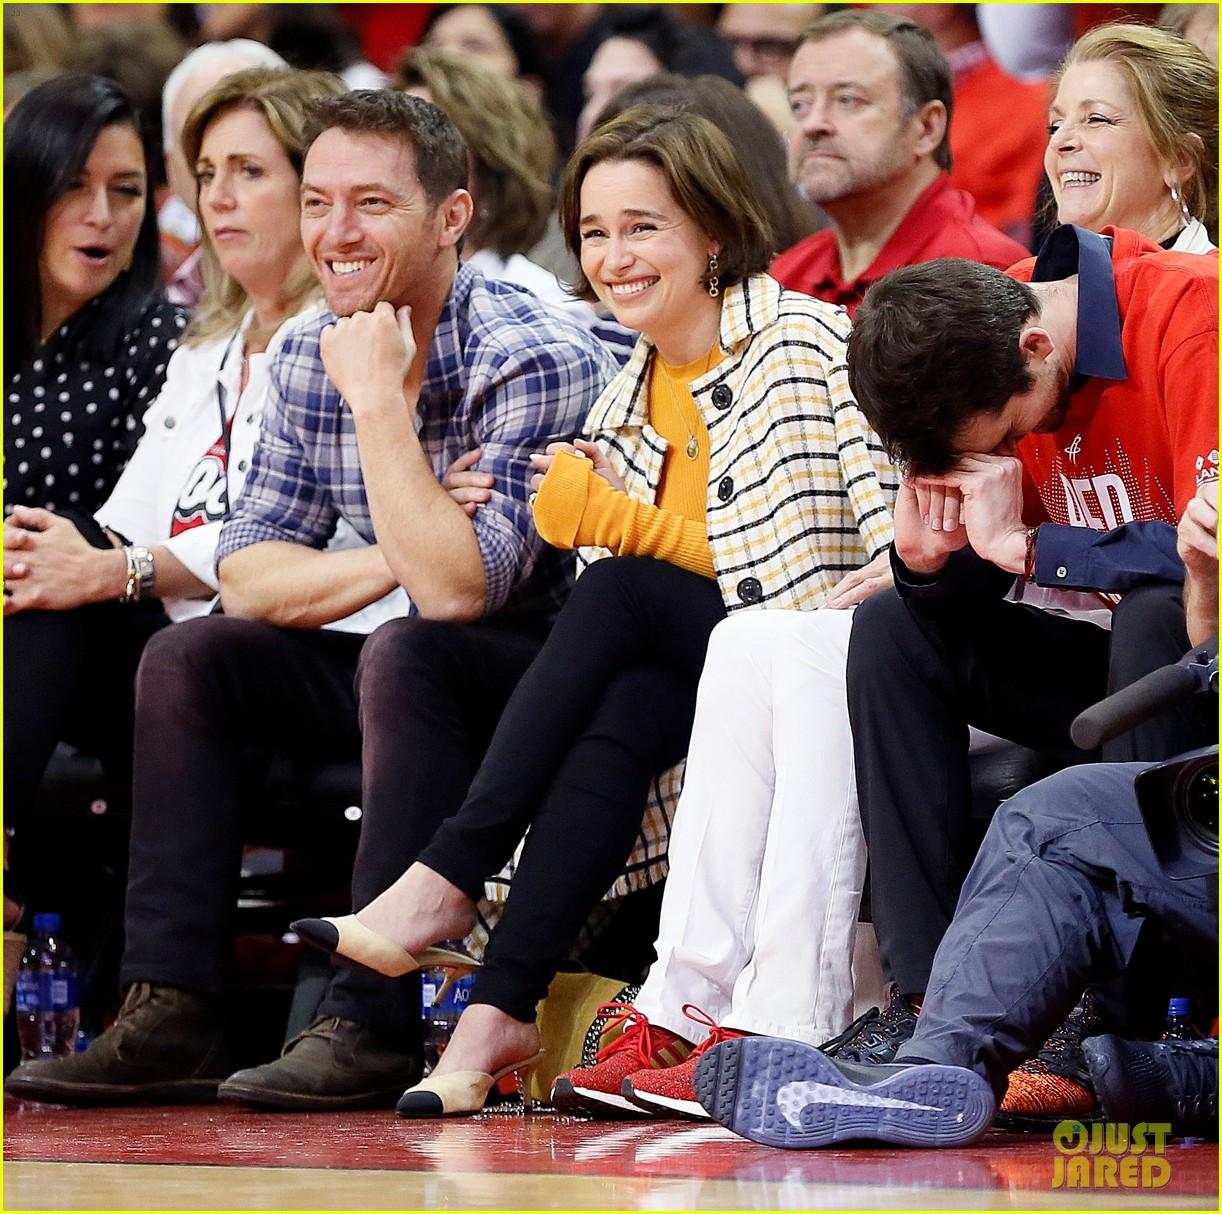 Rockets Vs Warriors Full Game 2019: GOT's Emilia Clarke Treated To Coffee At NBA Game!: Photo